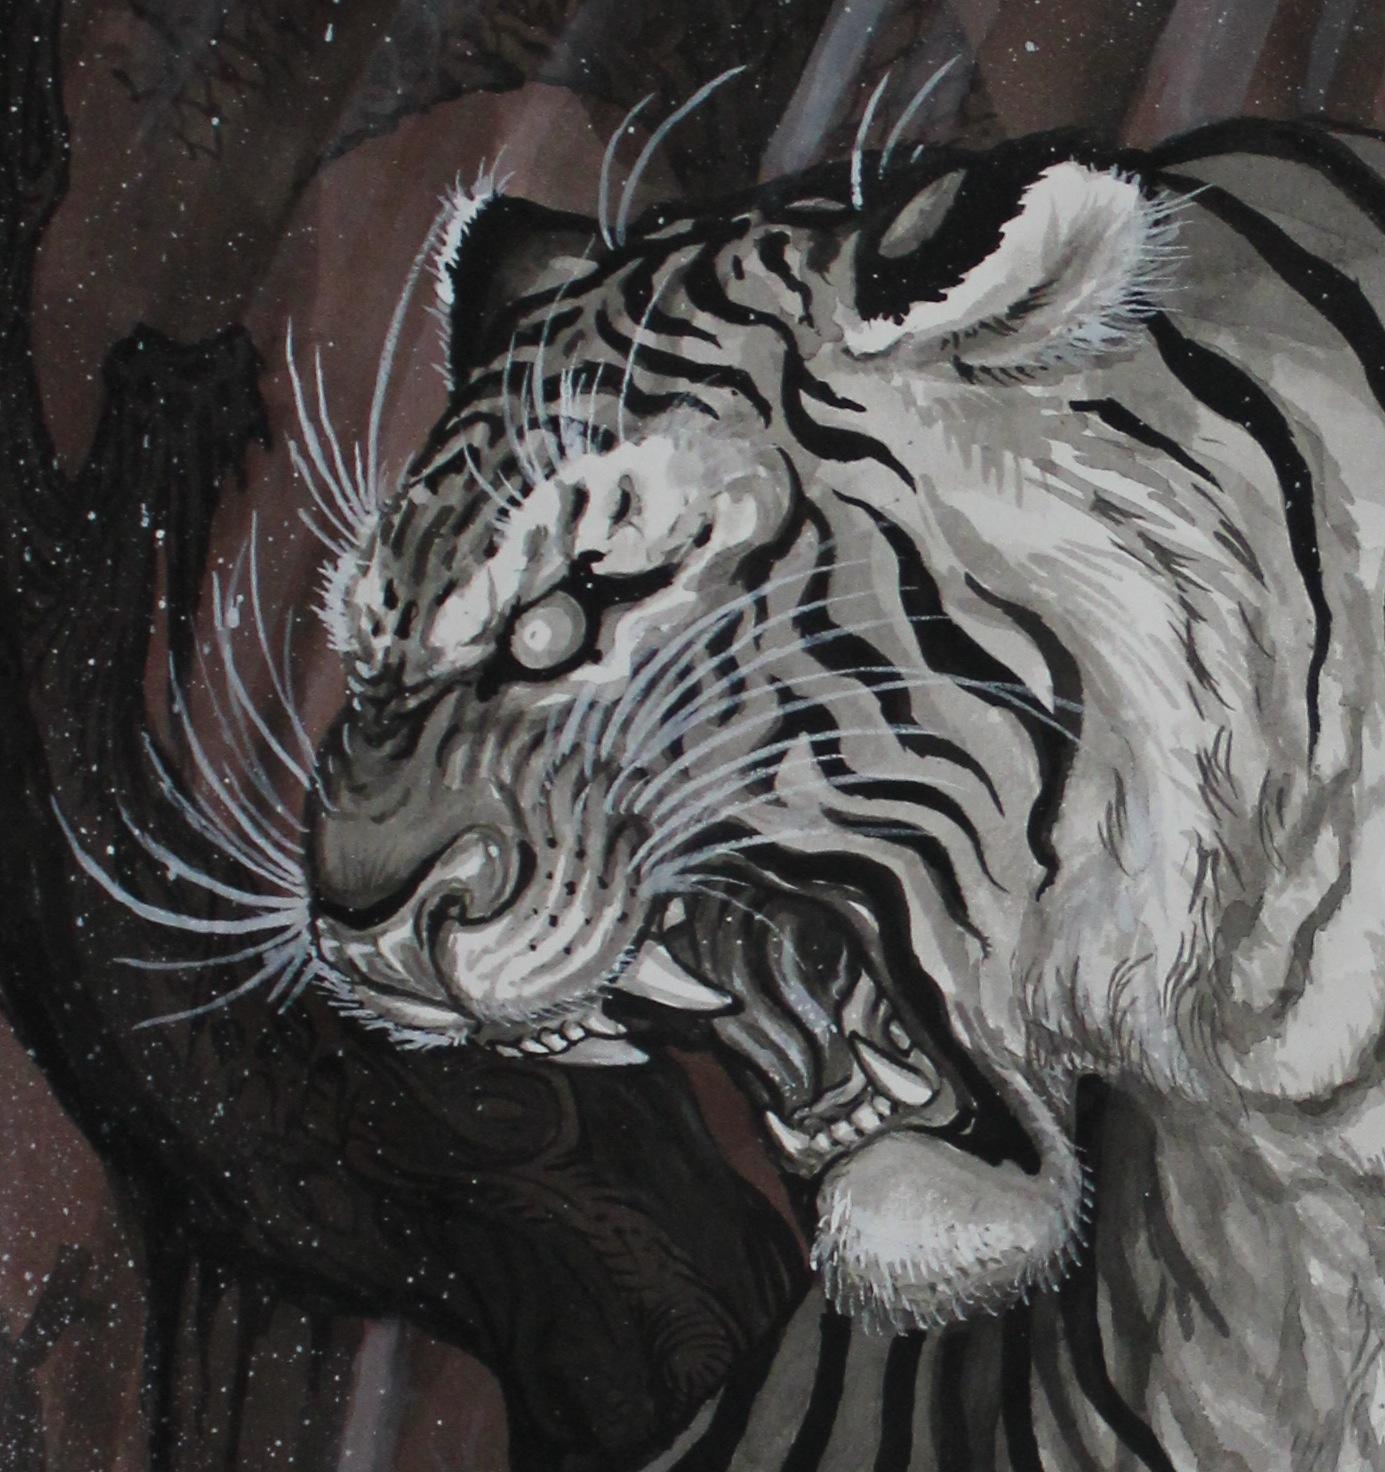 9e0c7822e TIM LEHI: dragon tiger tryptic AUG.13 art show sneak peek